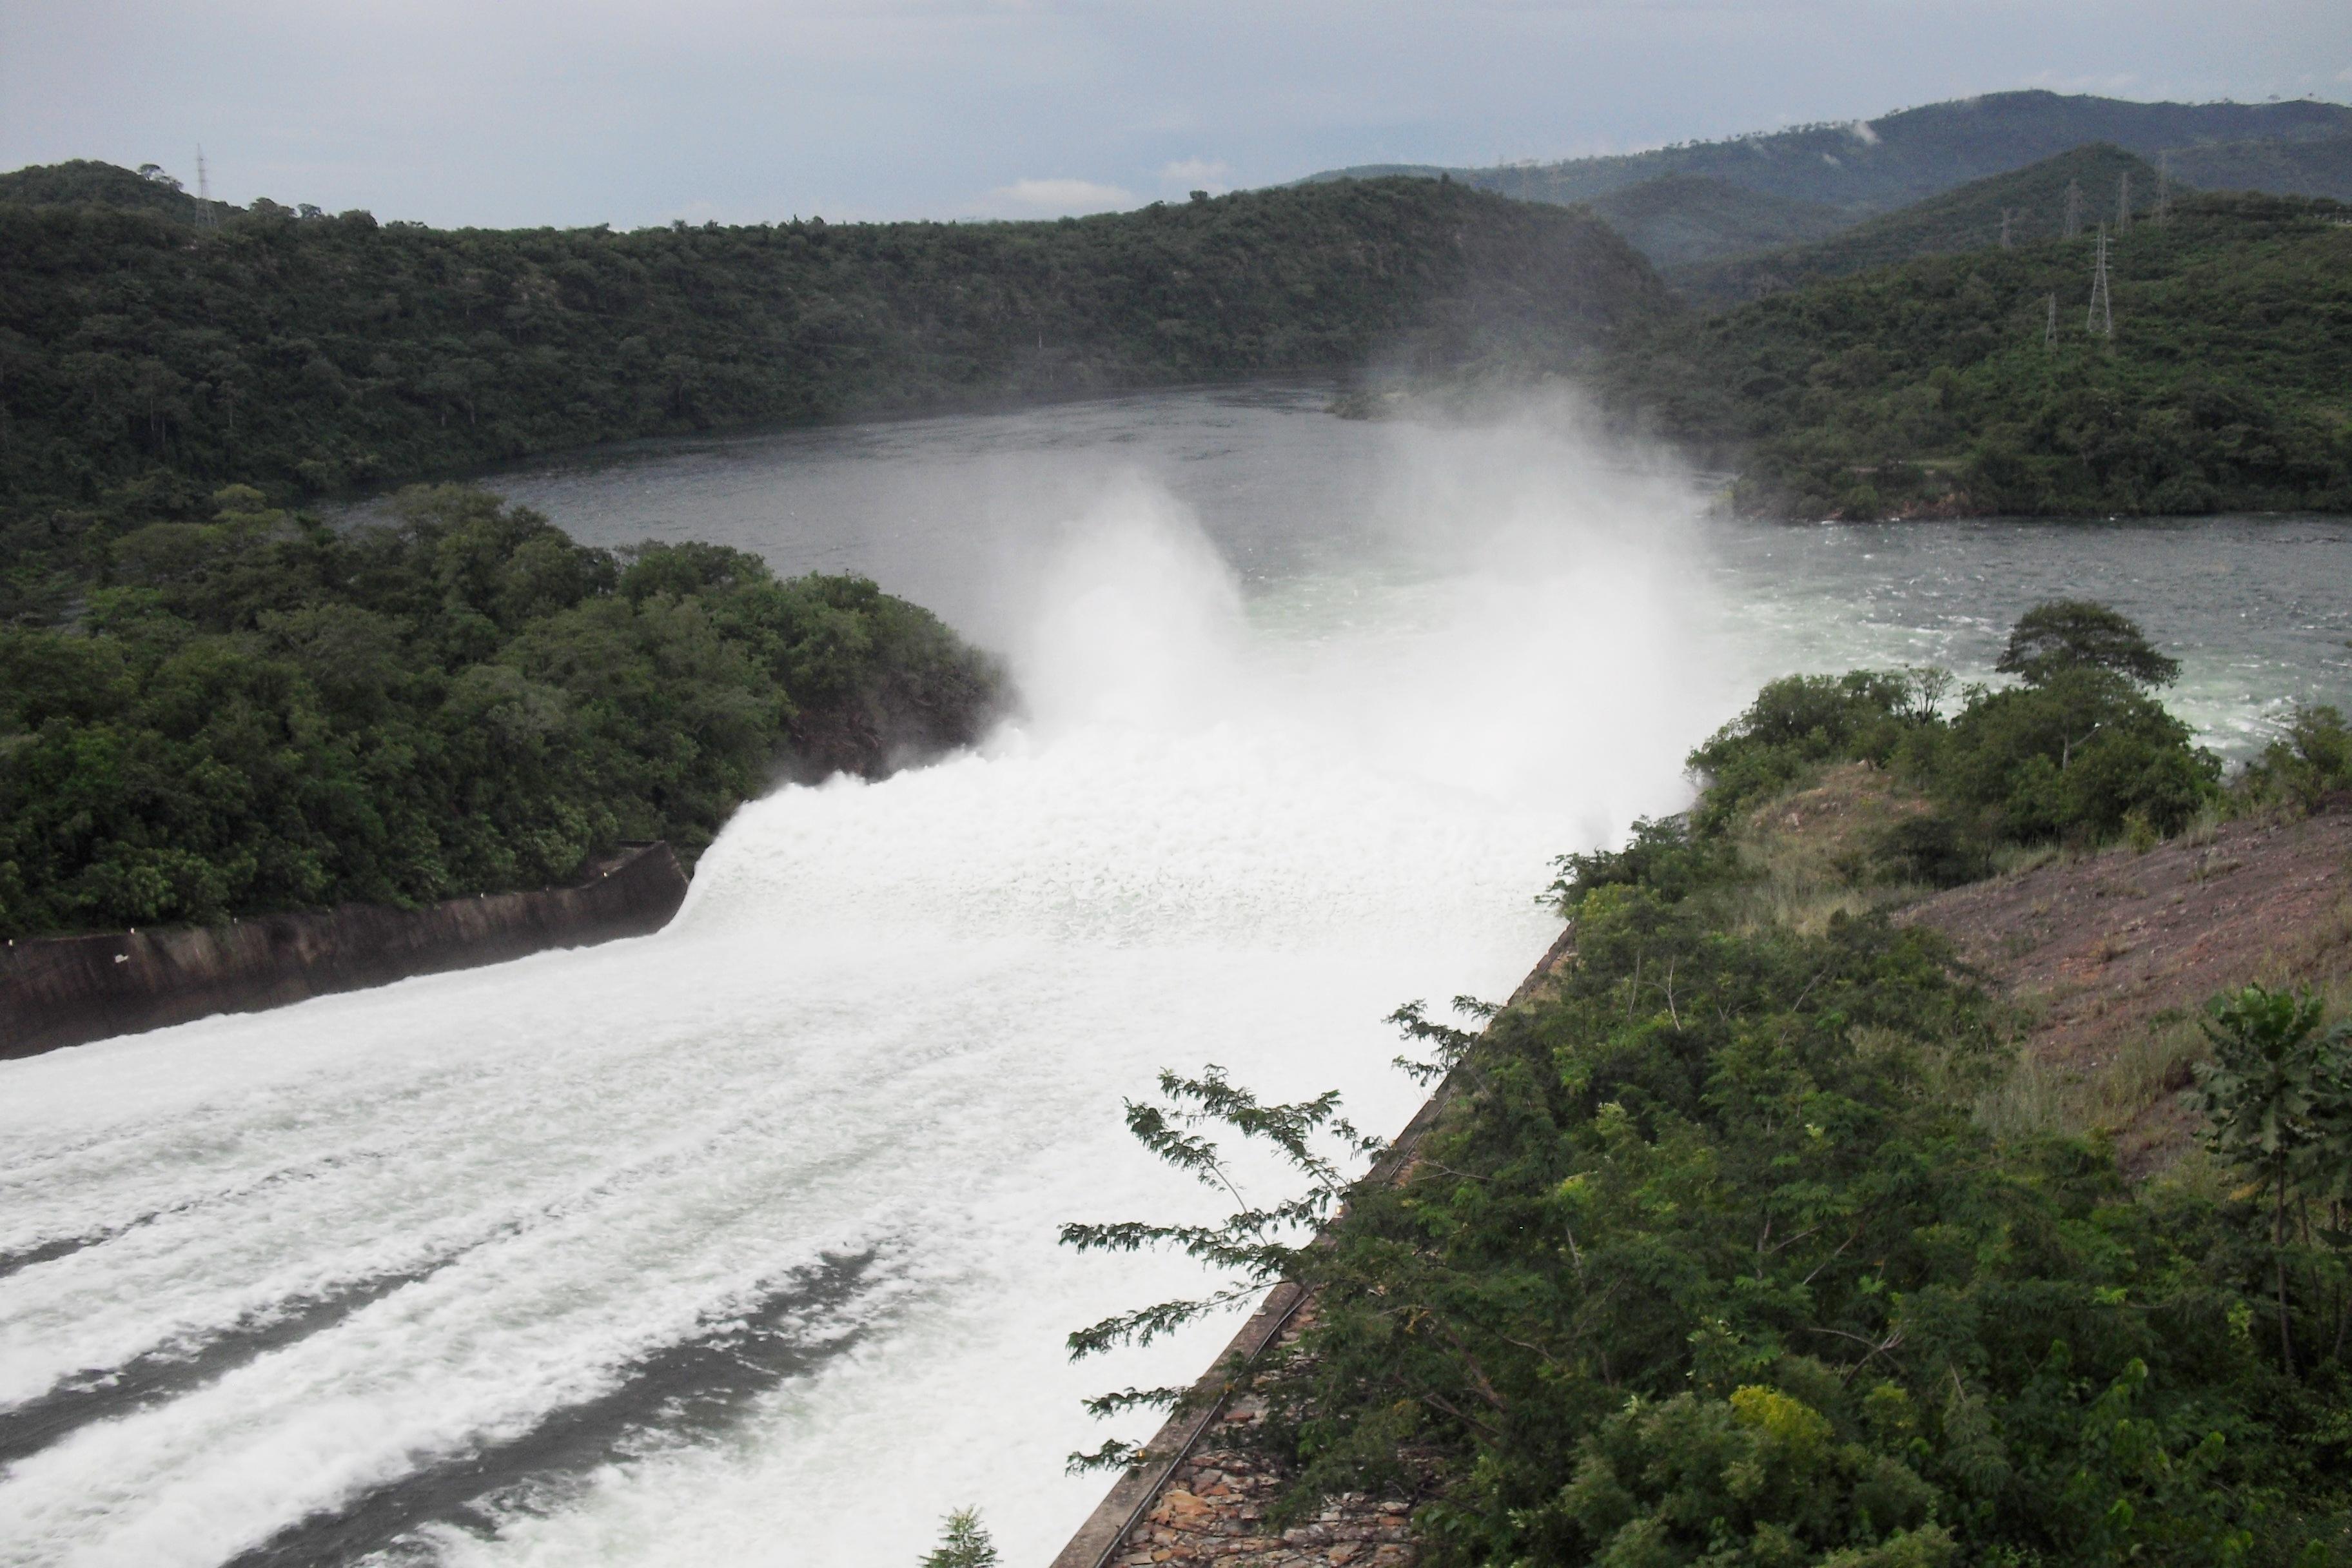 Akosombo Ghana  city photos gallery : Description Akosombo Dam spilling water, Akosombo, Ghana 20101106 ...